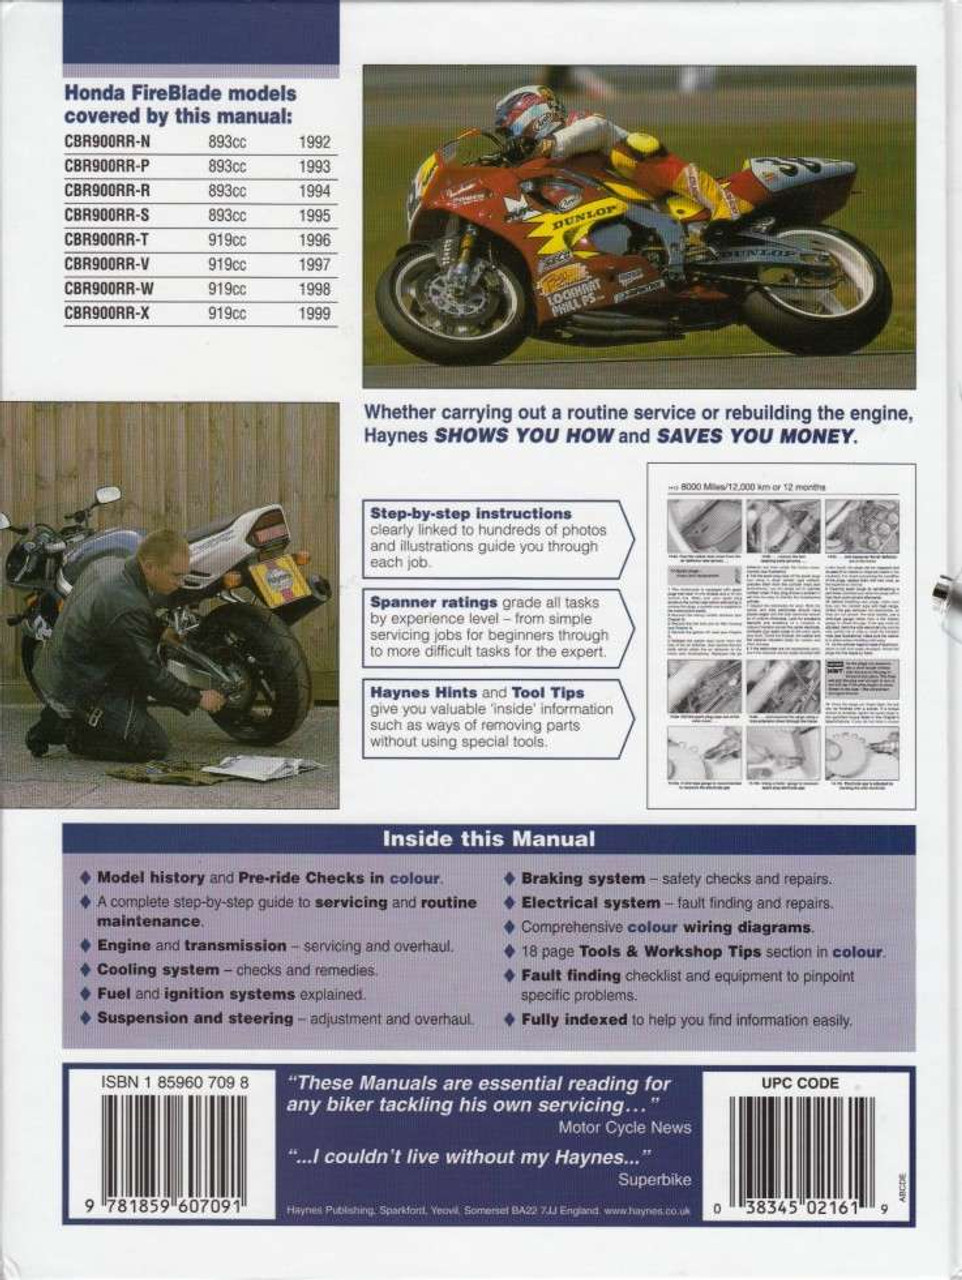 honda cbr900rr fireblade fours 1992 1999 workshop manual  92 cbr900rr wiring diagram #13